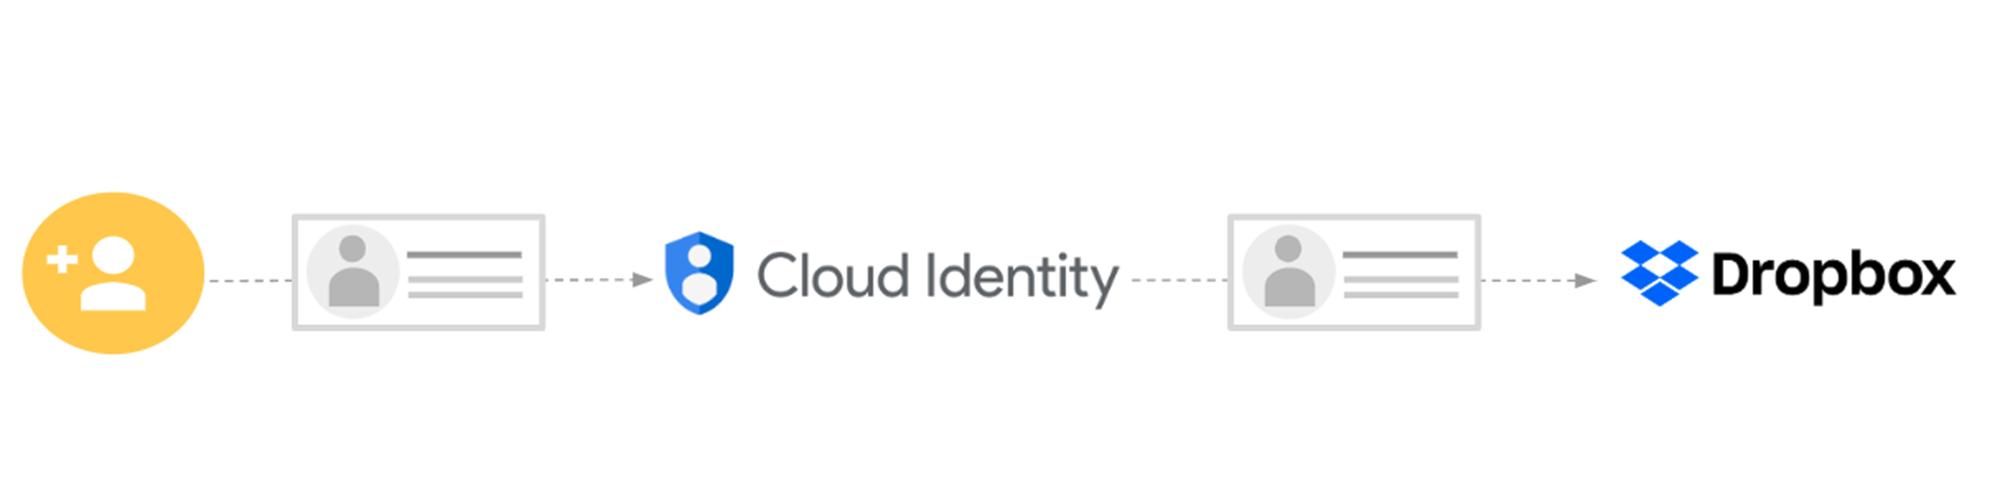 cloud identity.png